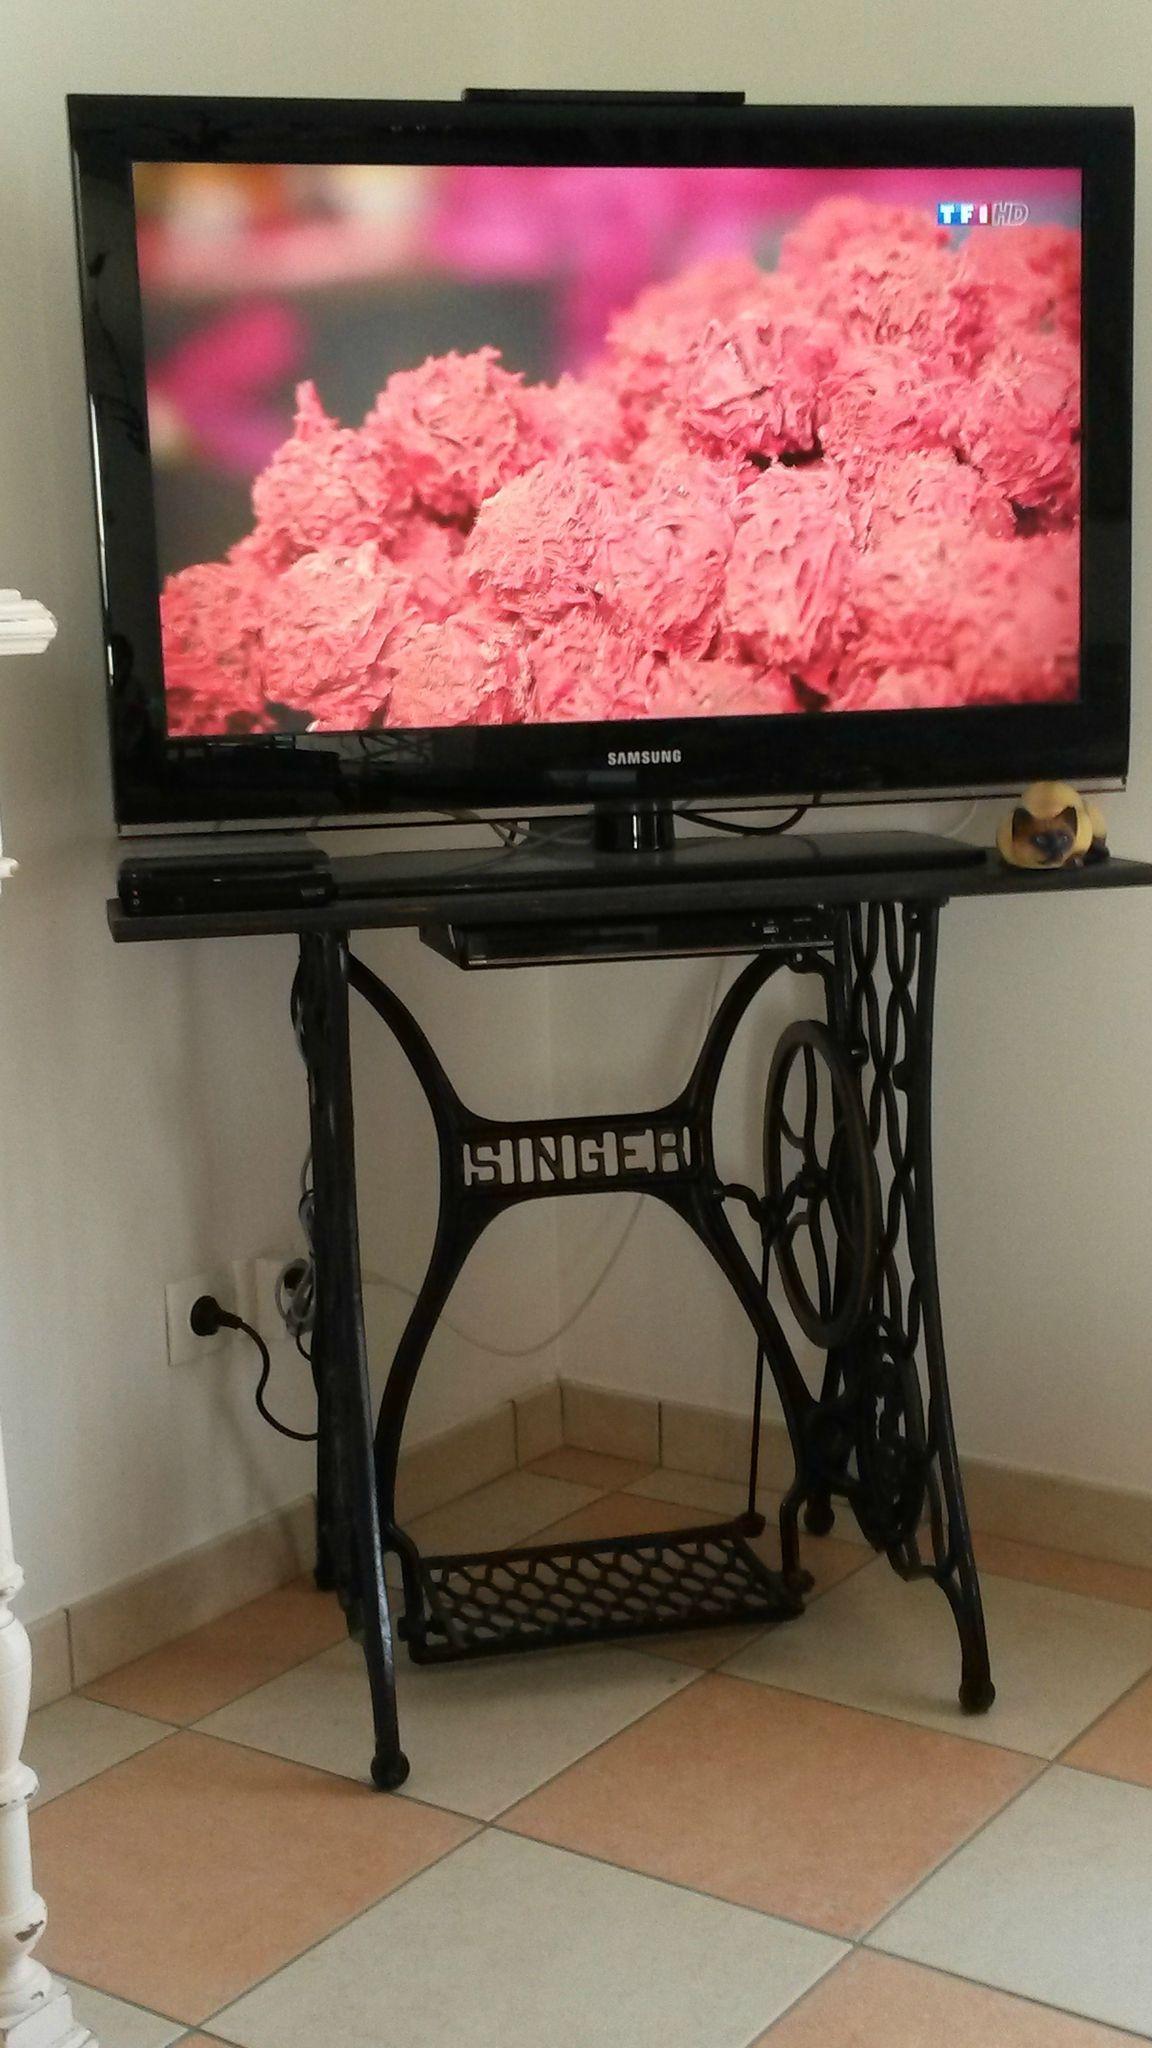 Ancien Singer D Tourn E En Meuble Tv Deco Pinterest # Meuble Tv Ultra Compact